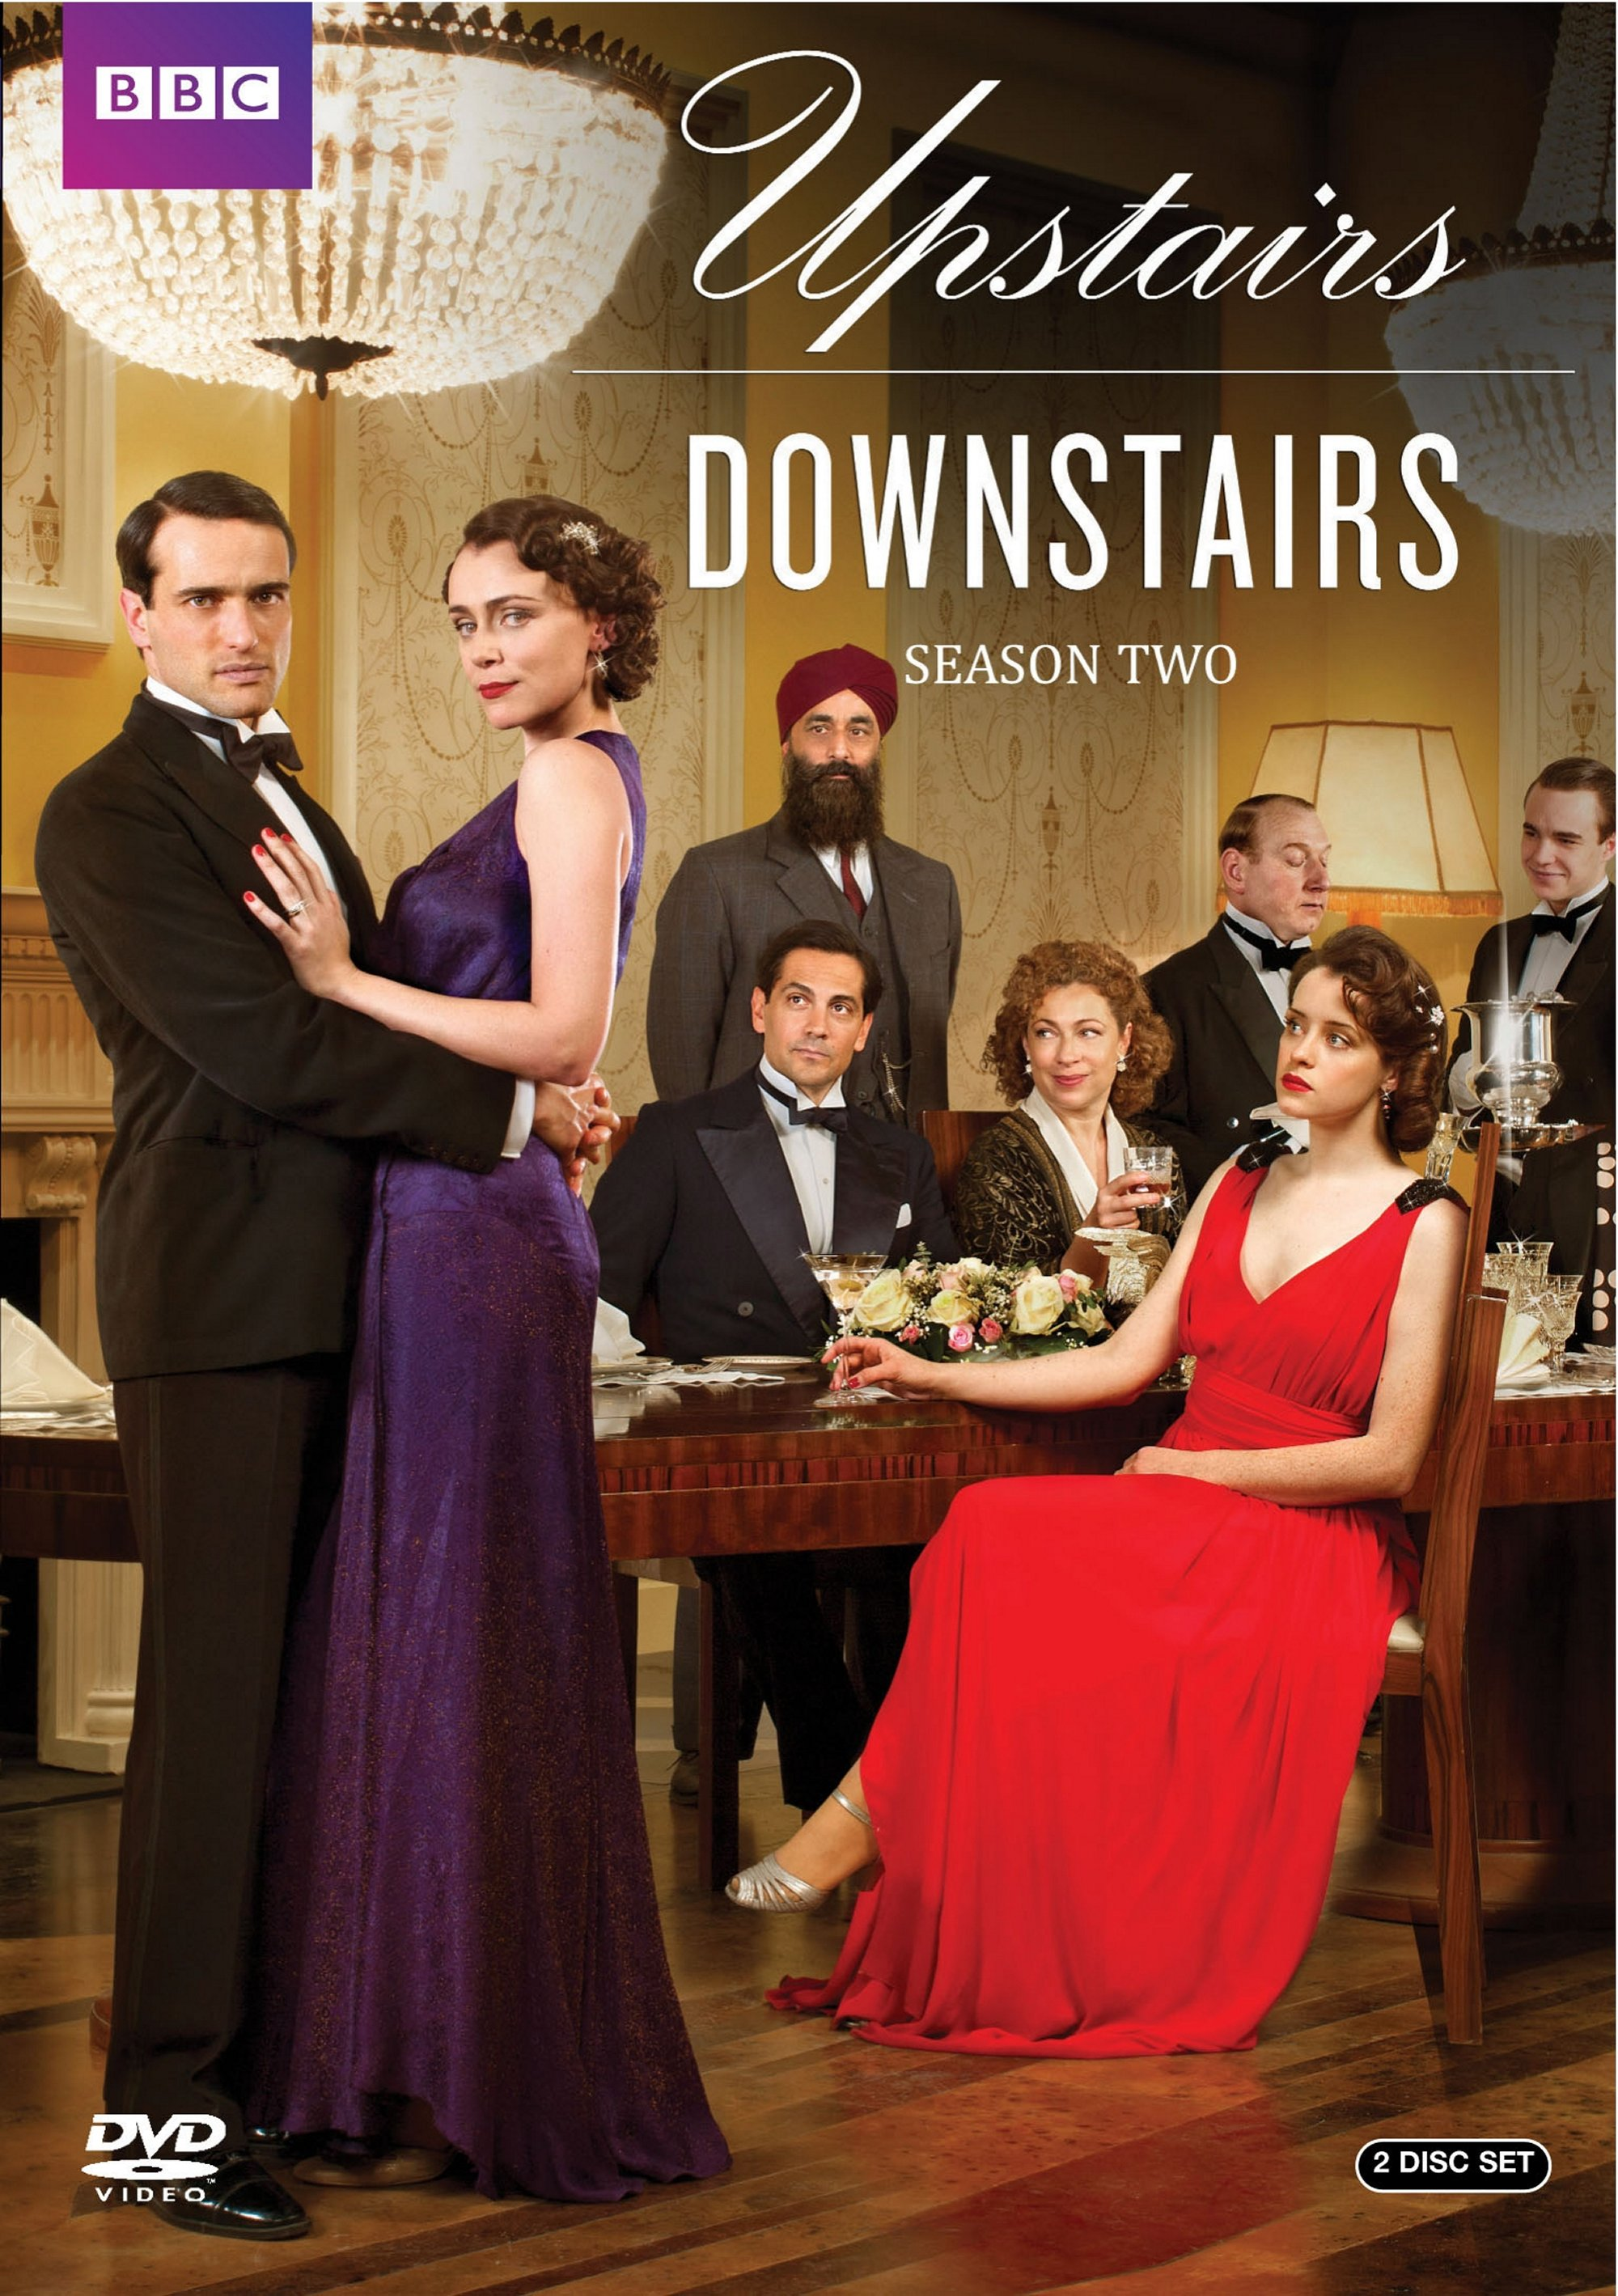 Upstairs, Downstairs Season 2 (DVD)